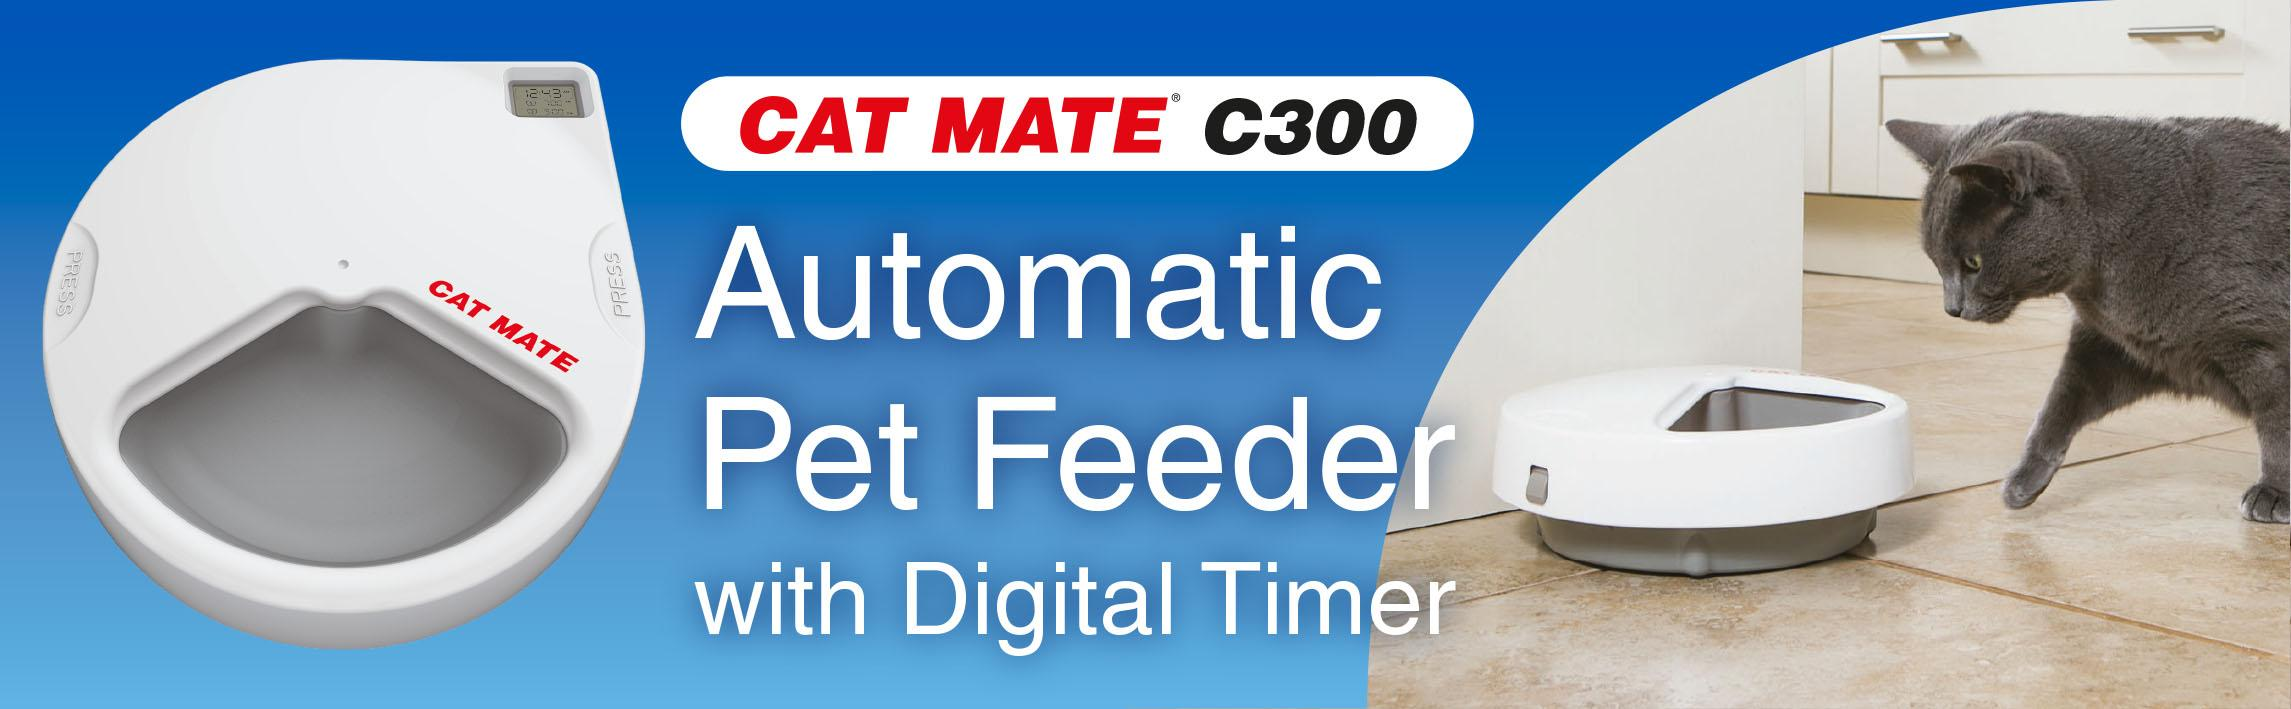 Amazon Com Cat Mate C300 Automatic 3 Meal Pet Feeder